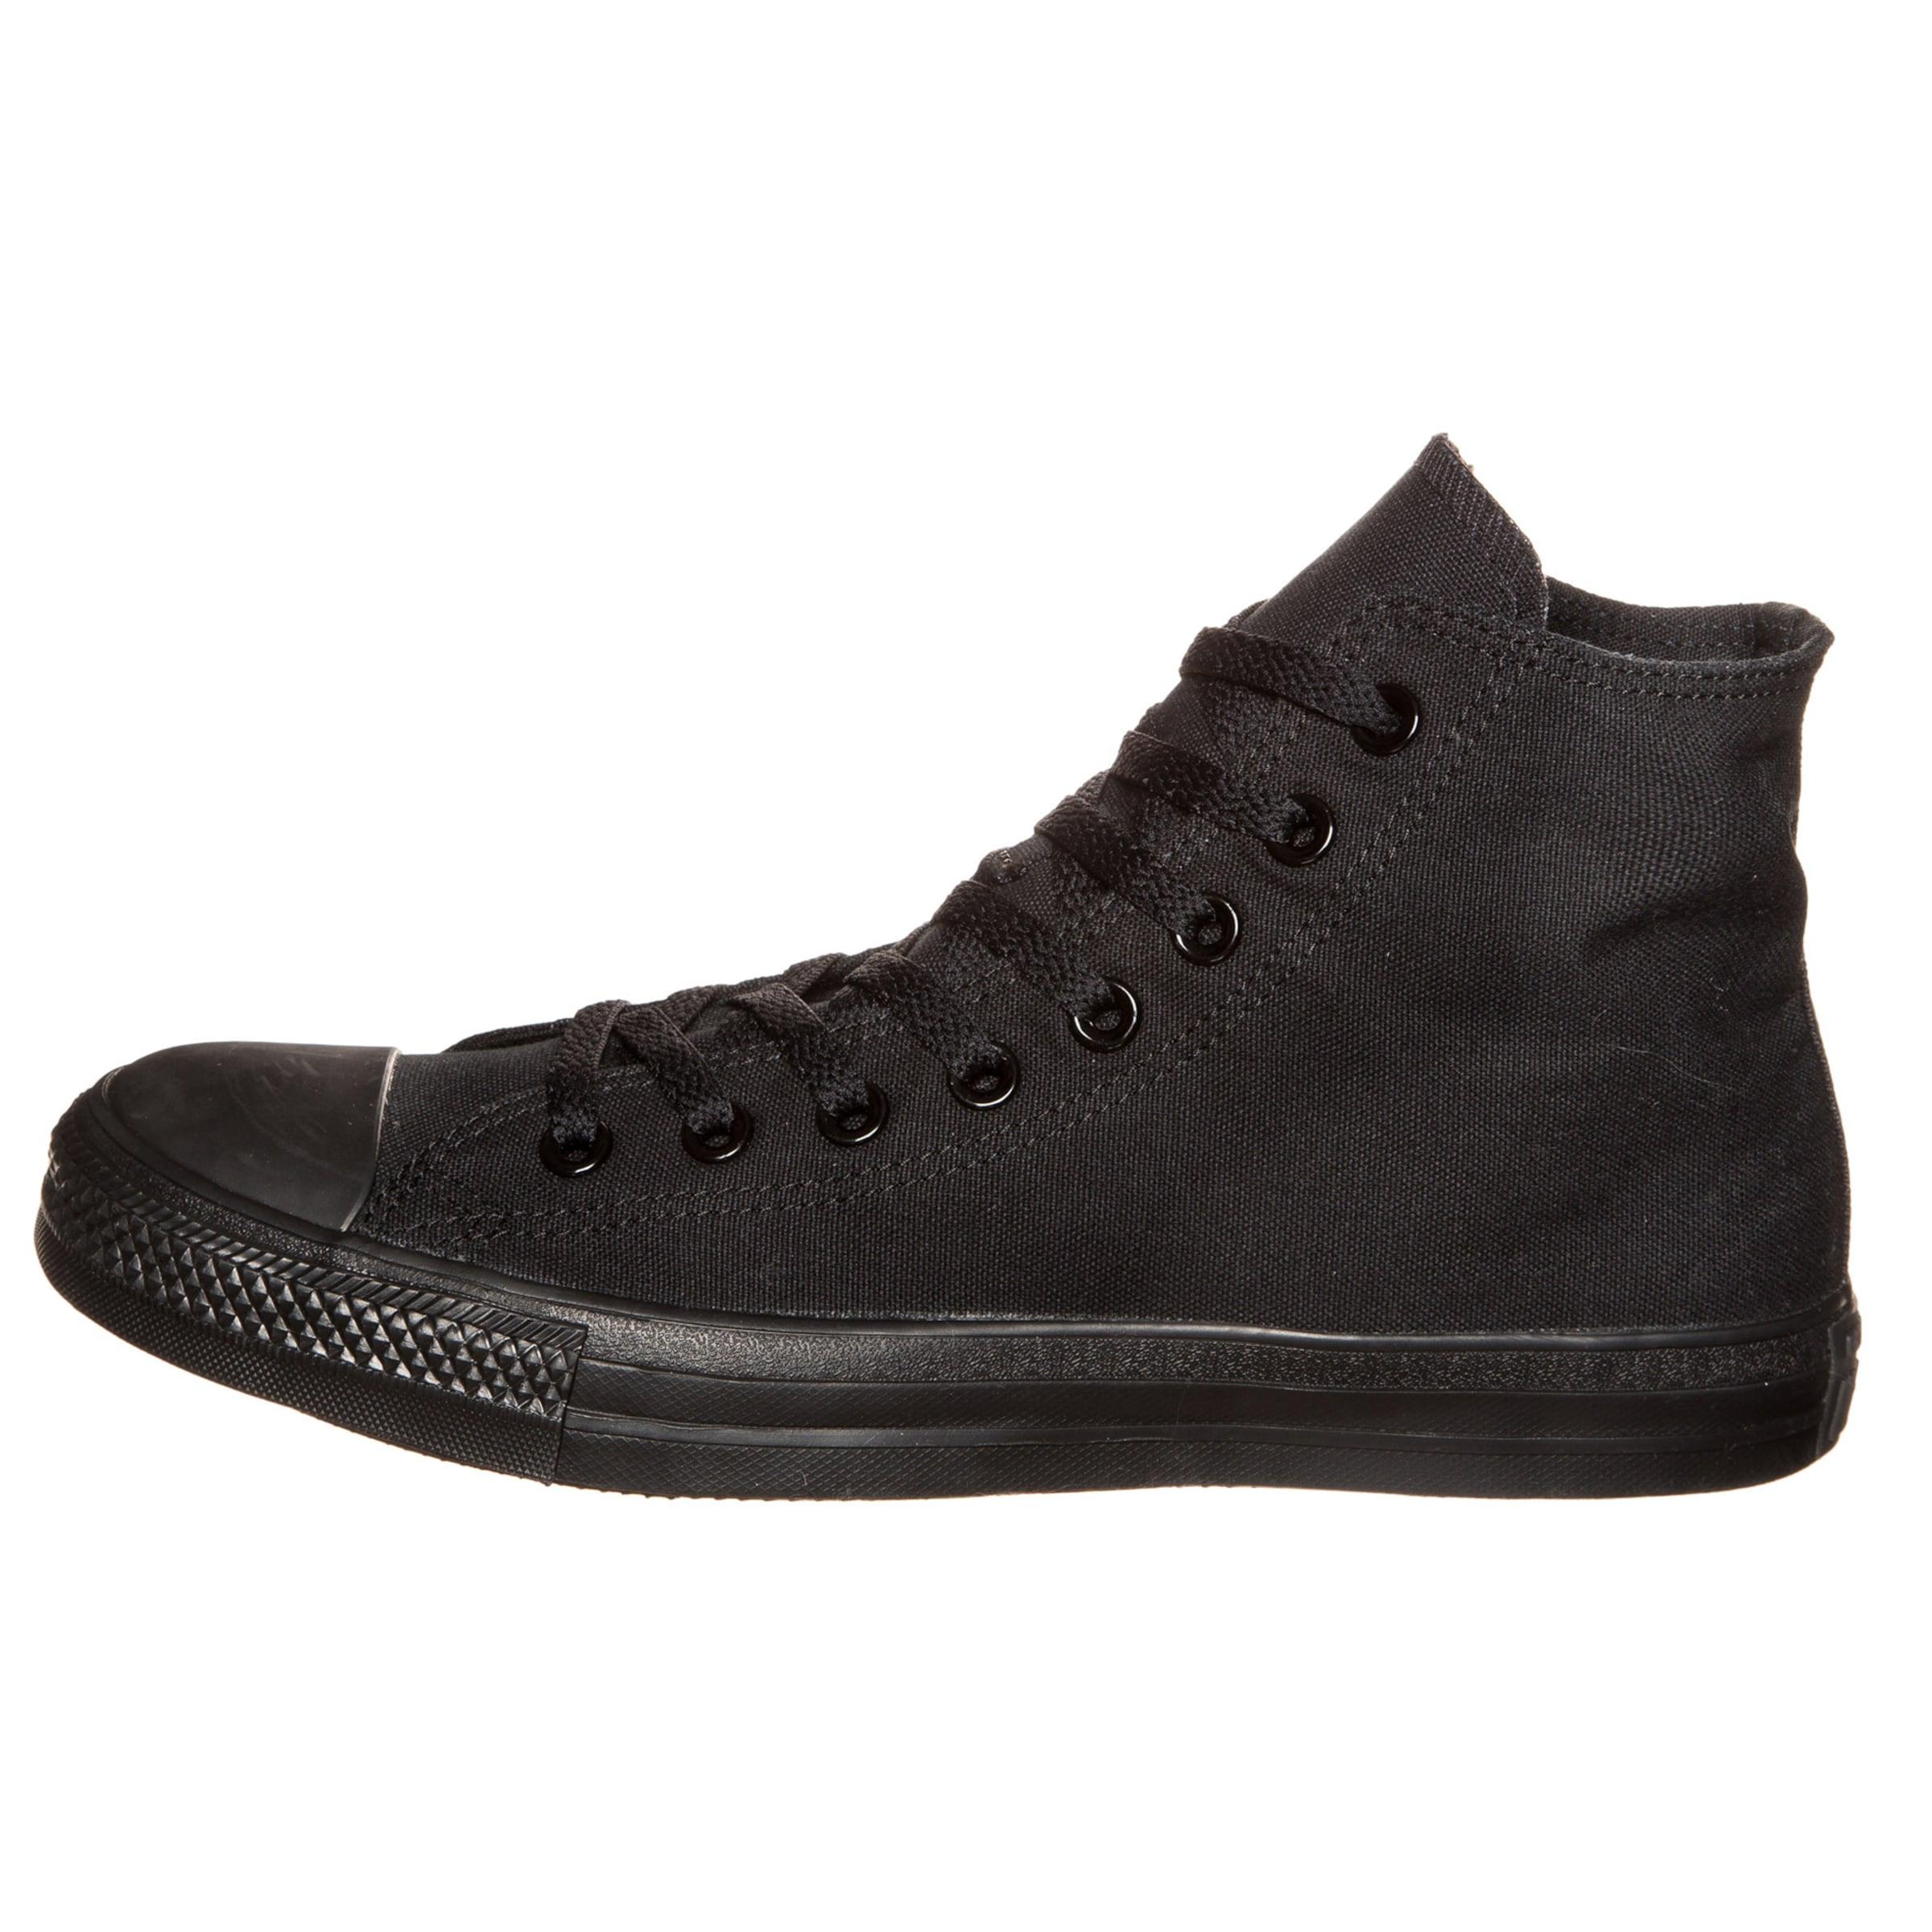 CONVERSE Hög sneaker 'CTAS' i svart